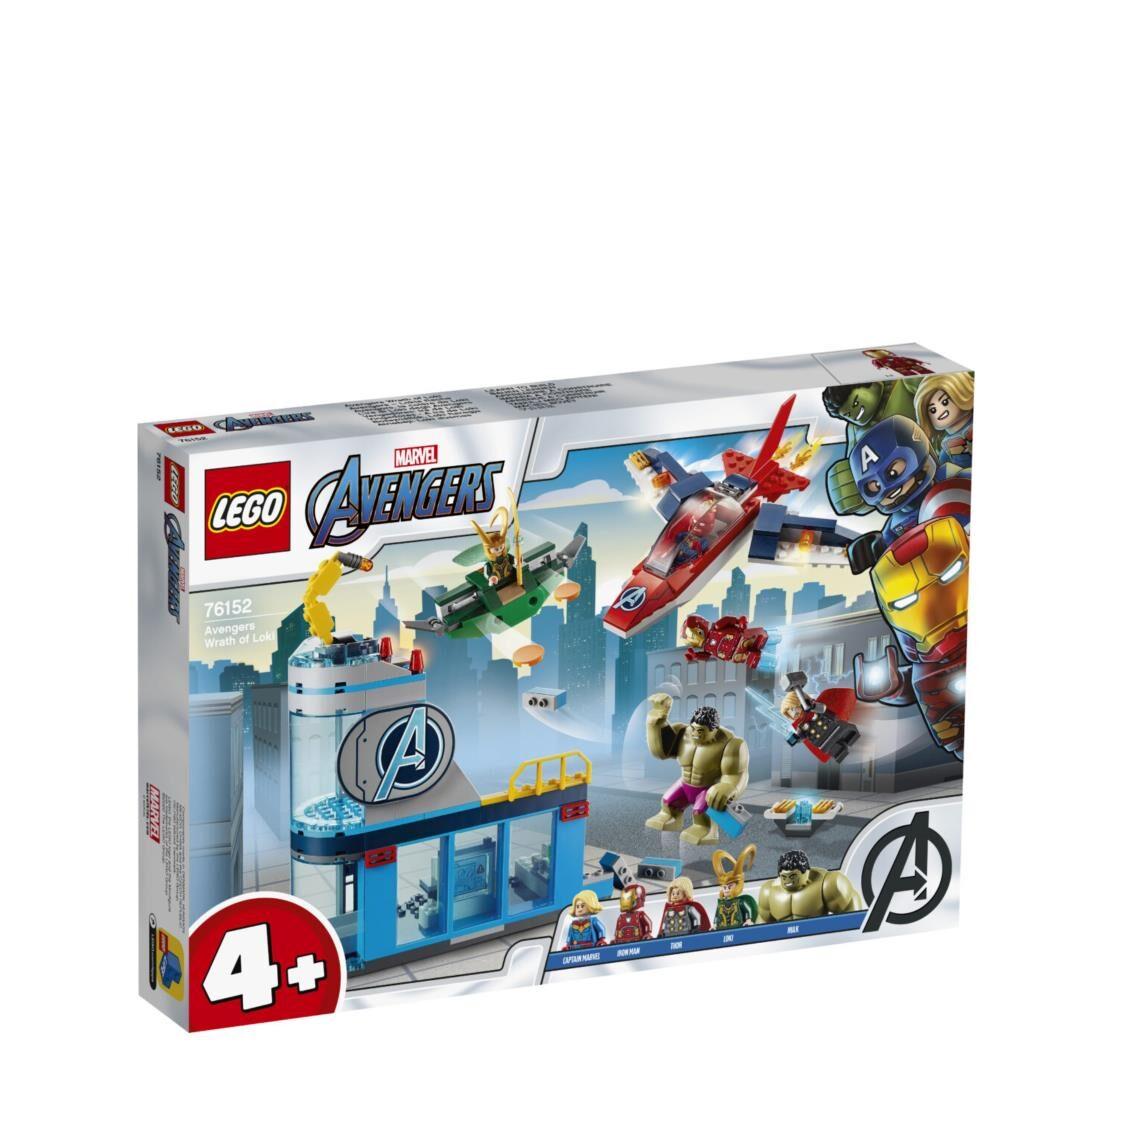 LEGO Marvel Avengers - Wrath of Loki 76152 V29